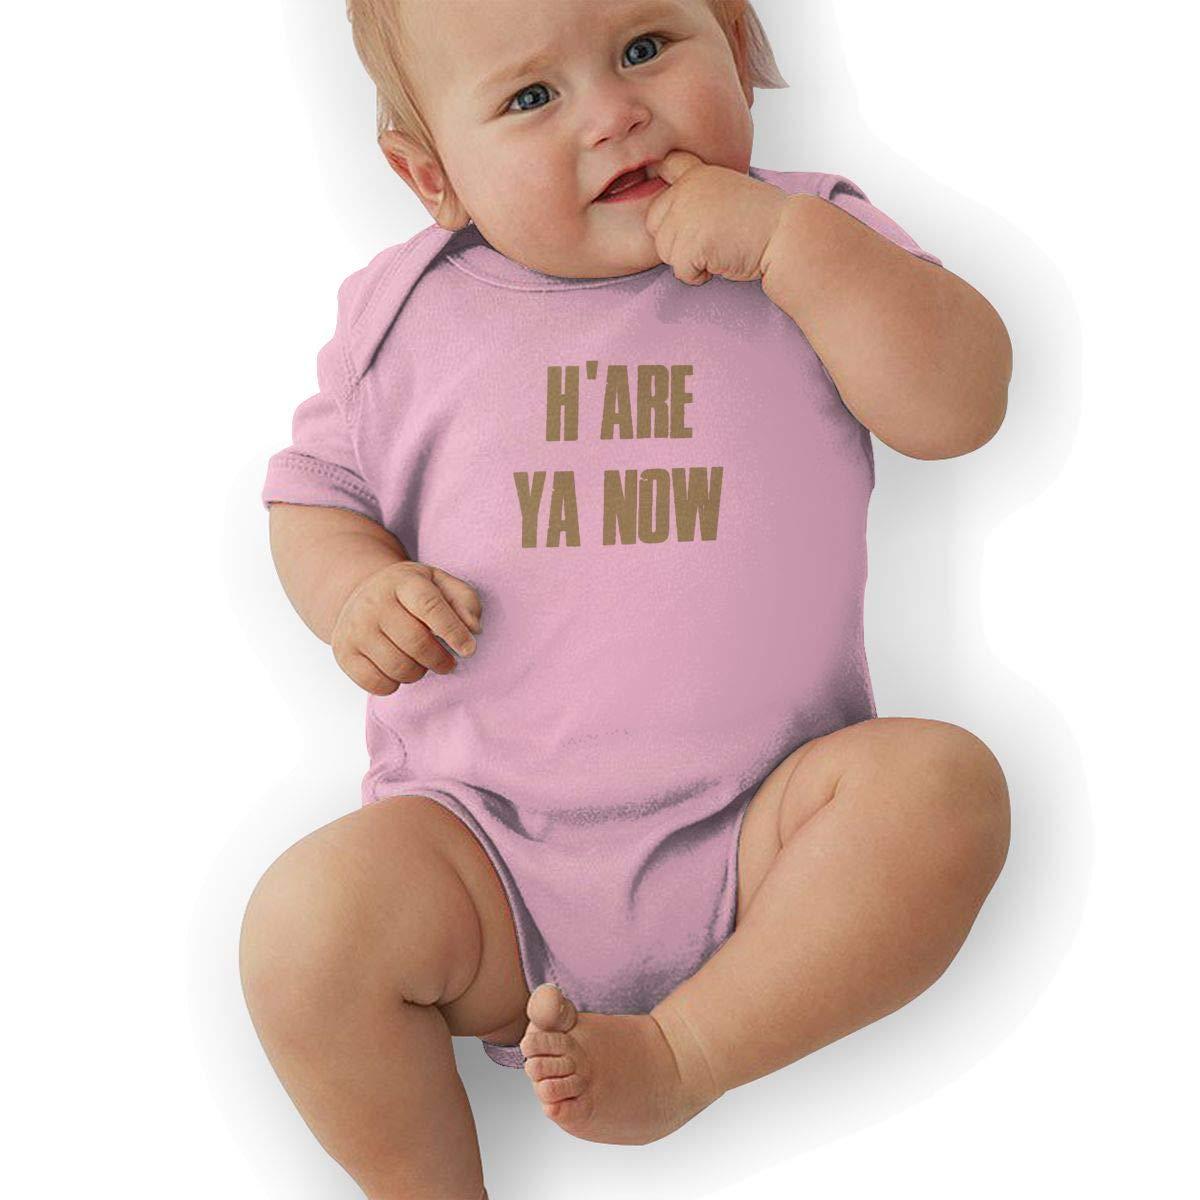 Hare Ya Now Graphic Newborn Baby Short Sleeve Bodysuit Romper Infant Summer Clothing